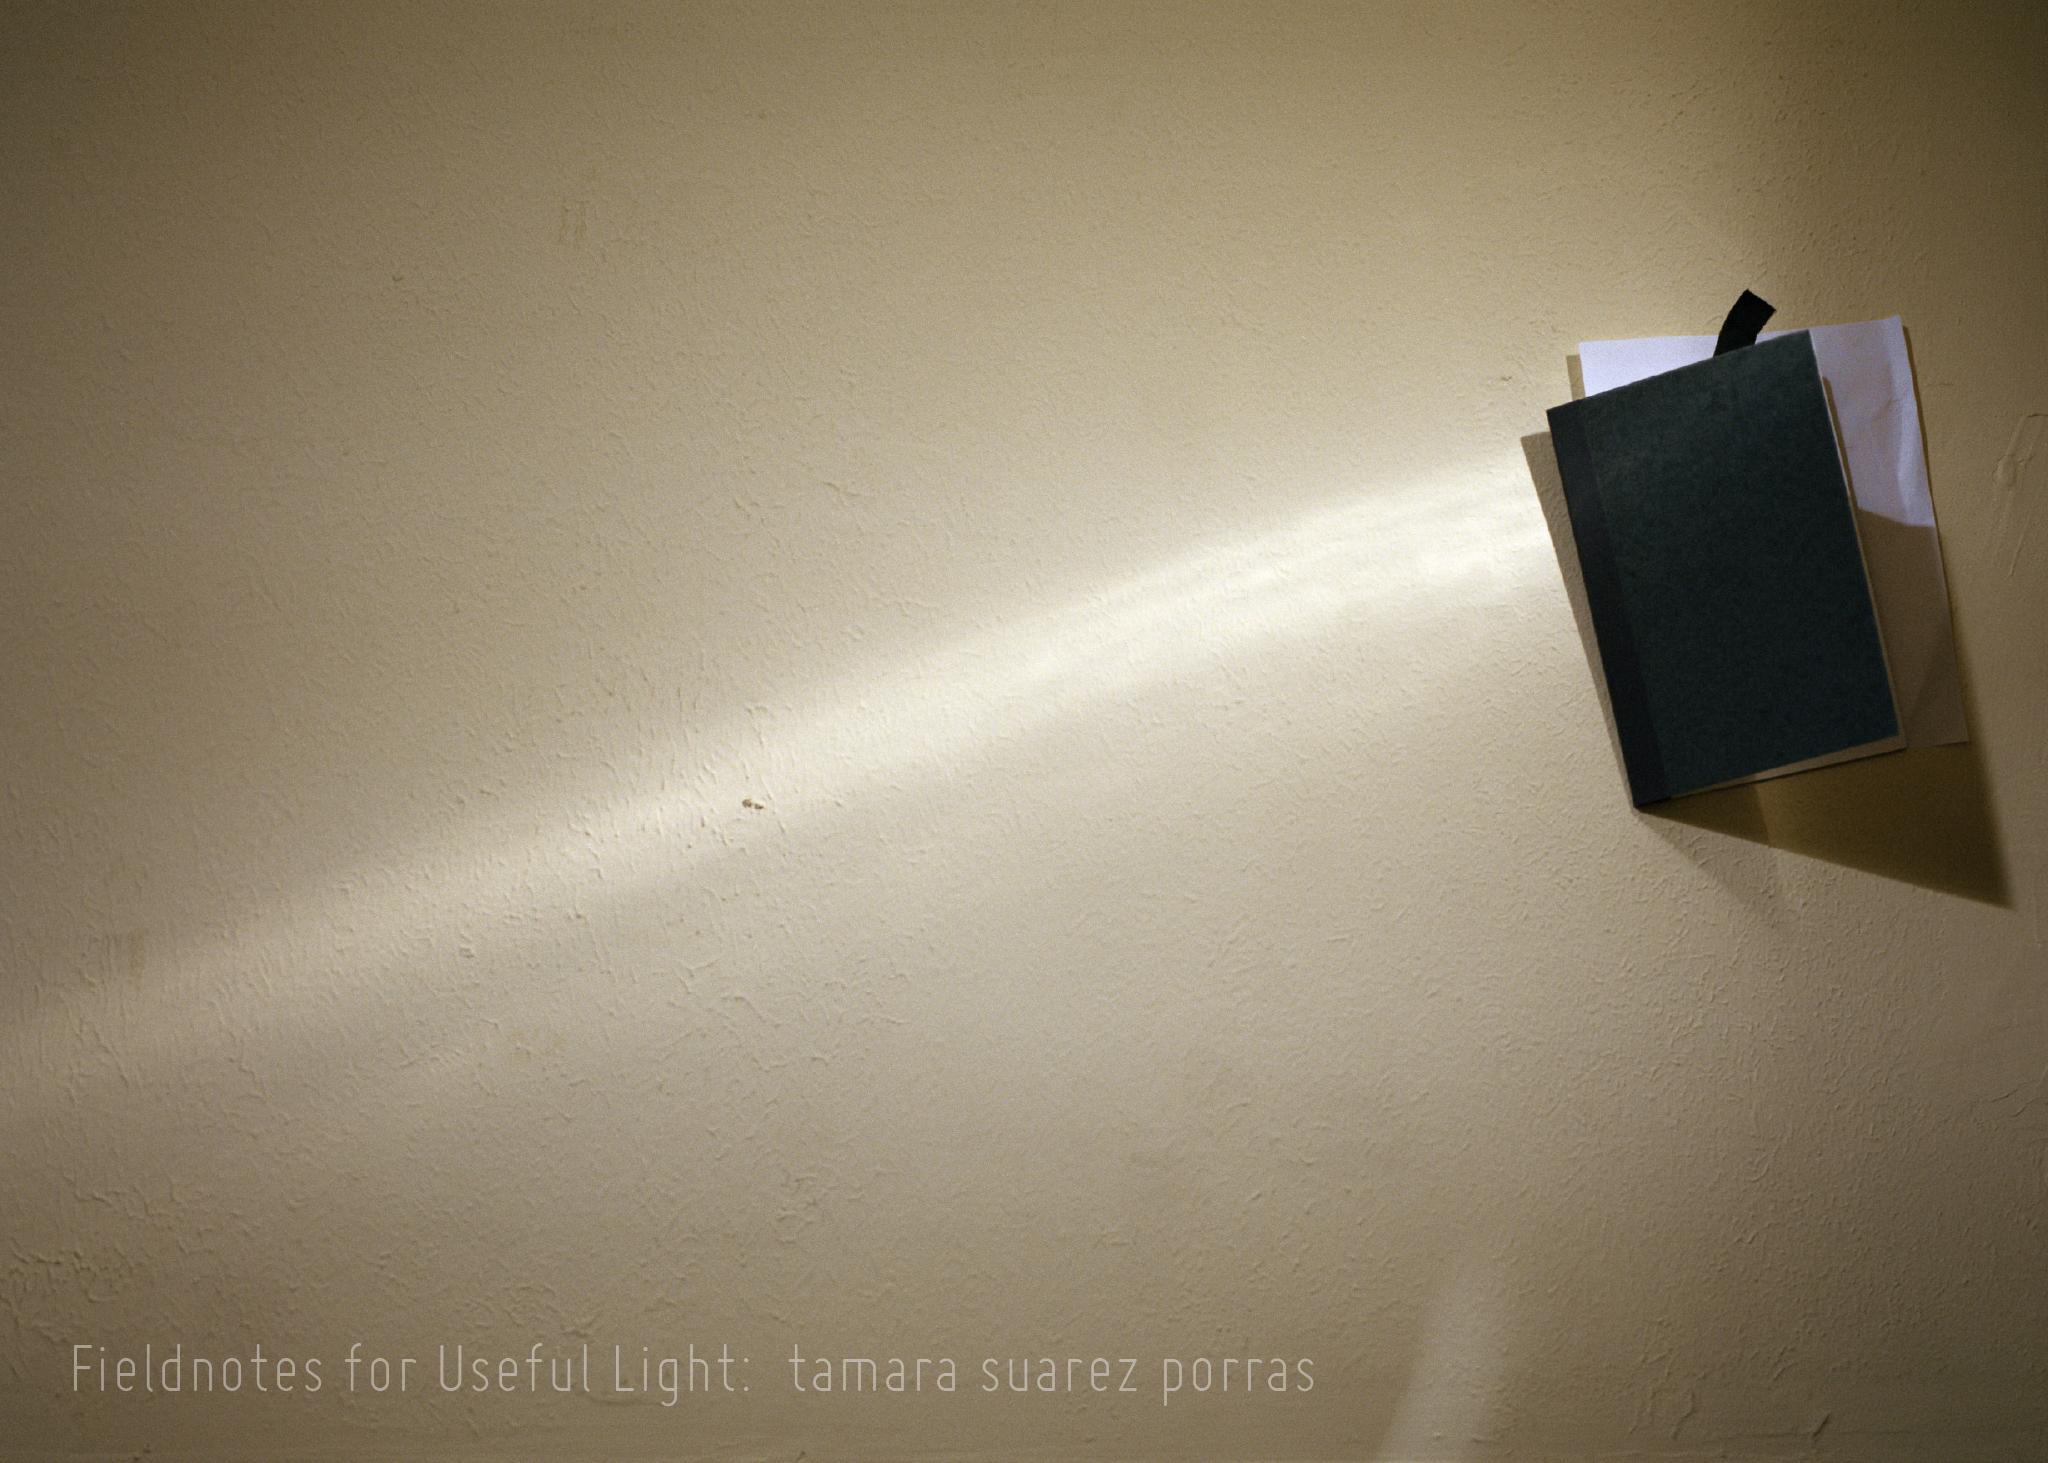 Fieldnotes for Useful Light: tamara suarez porras   06.15.18-07.14.18